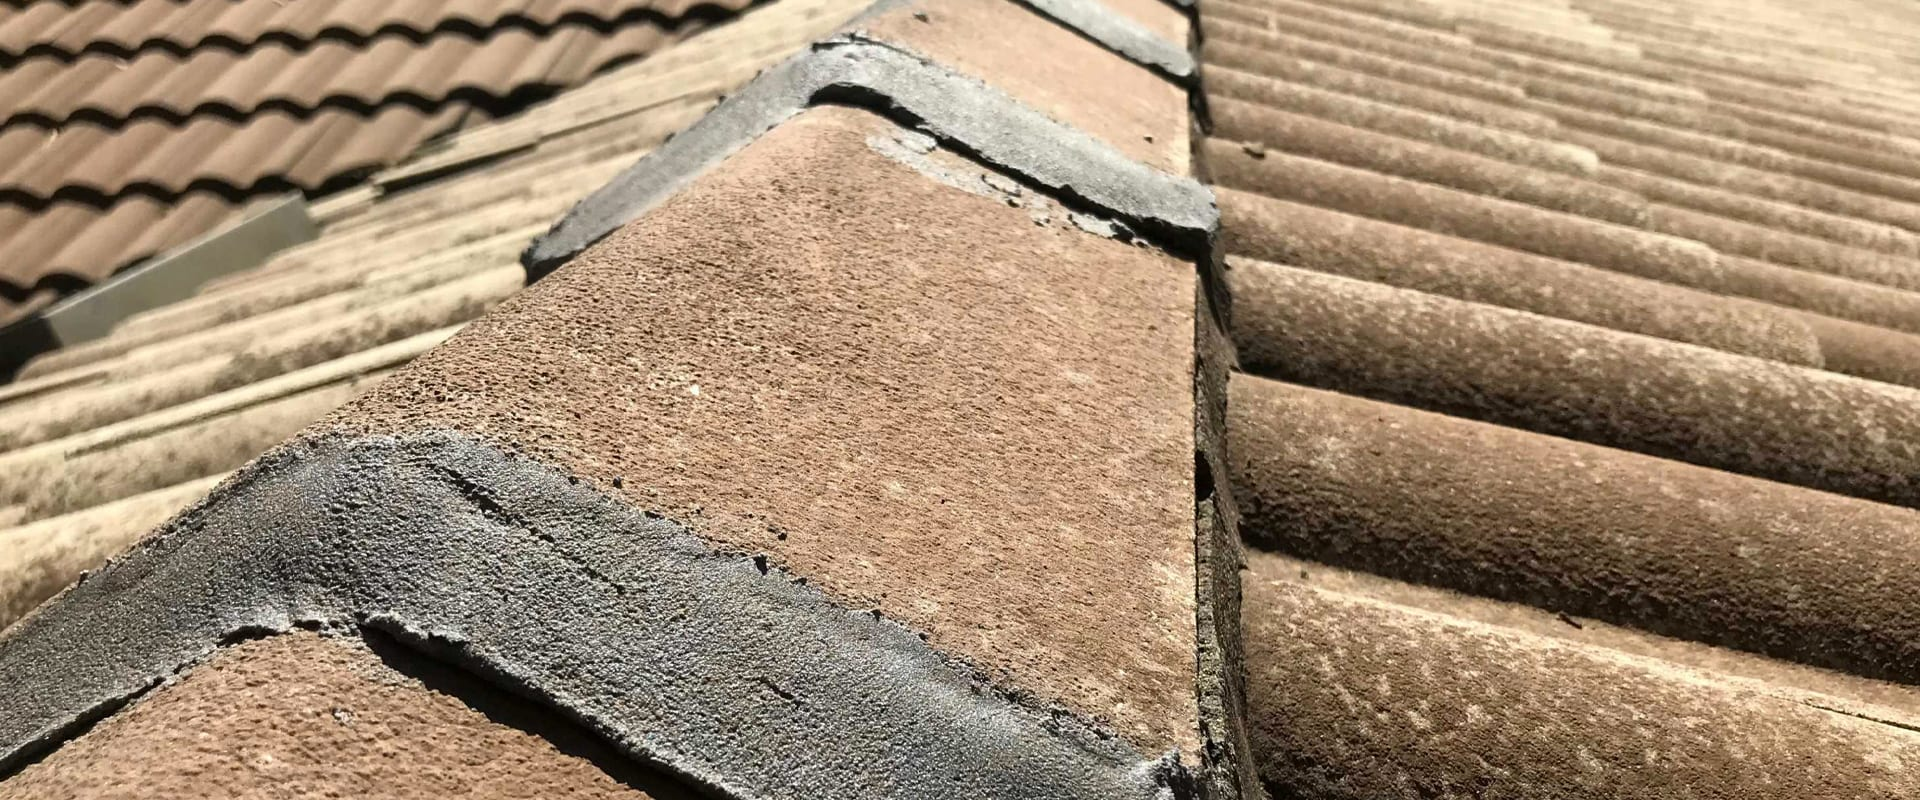 roof leak services Sydney